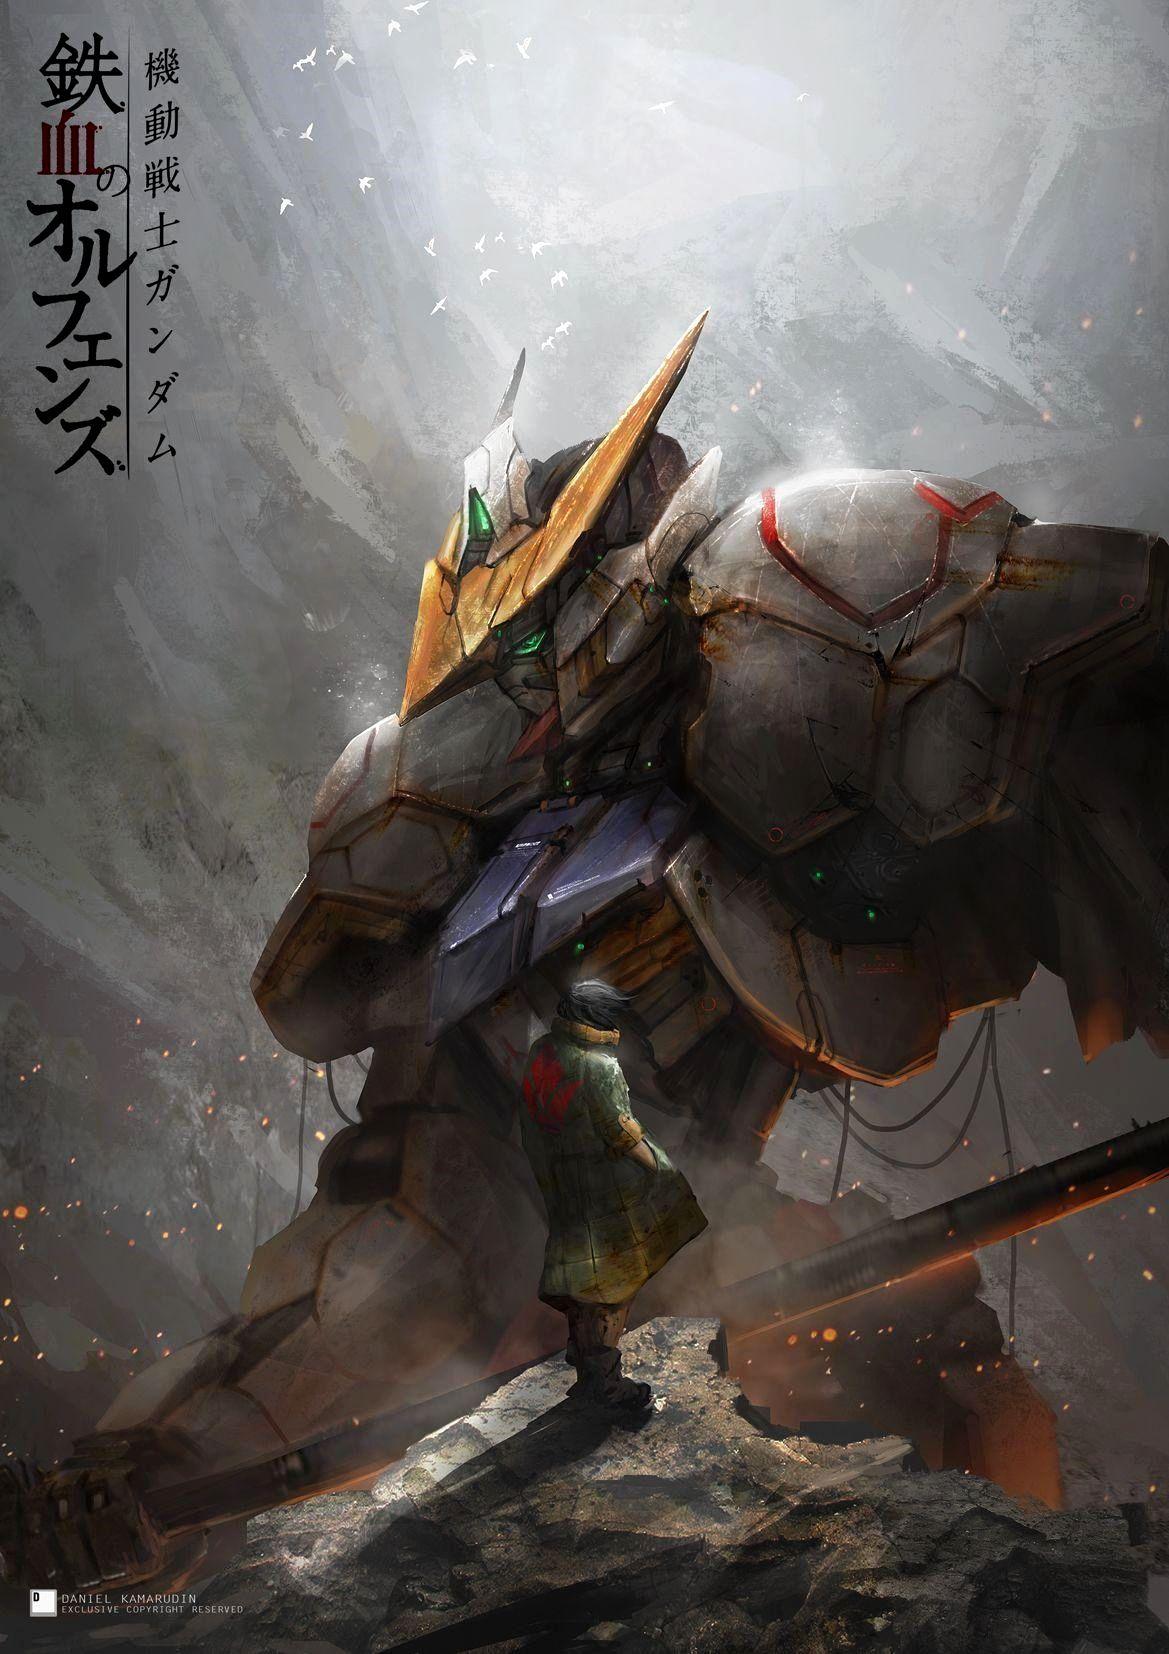 Gundam Wallpaper 4k Hd Gallery Seni Anime Gundam Wallpaper Ponsel